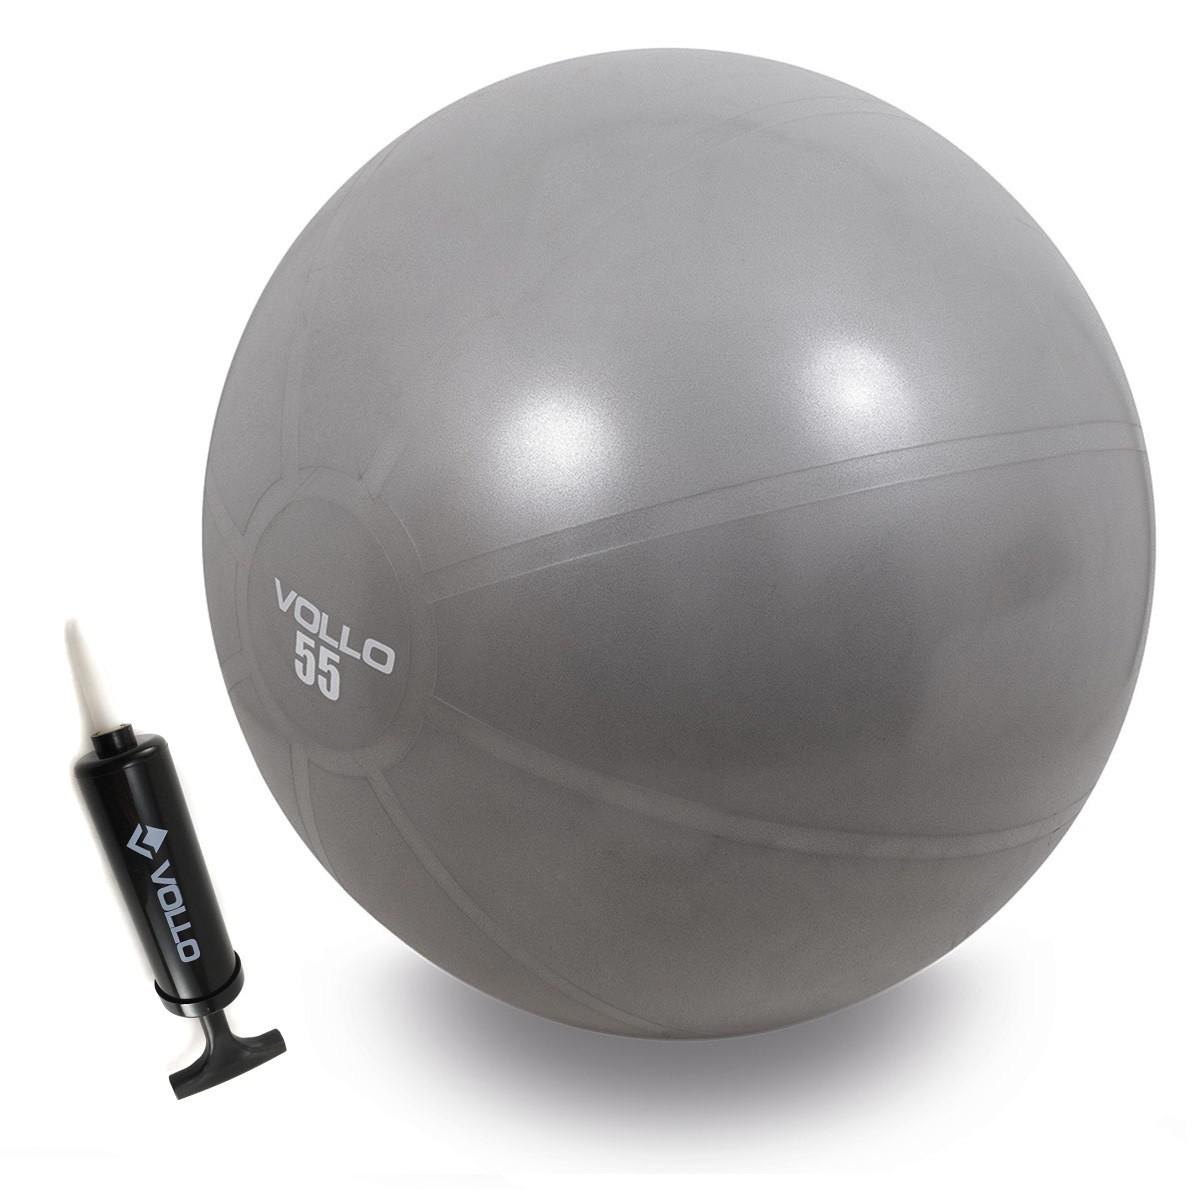 Bola Exercícios Academia Pilates Yoga Vollo com Bomba de Inflar